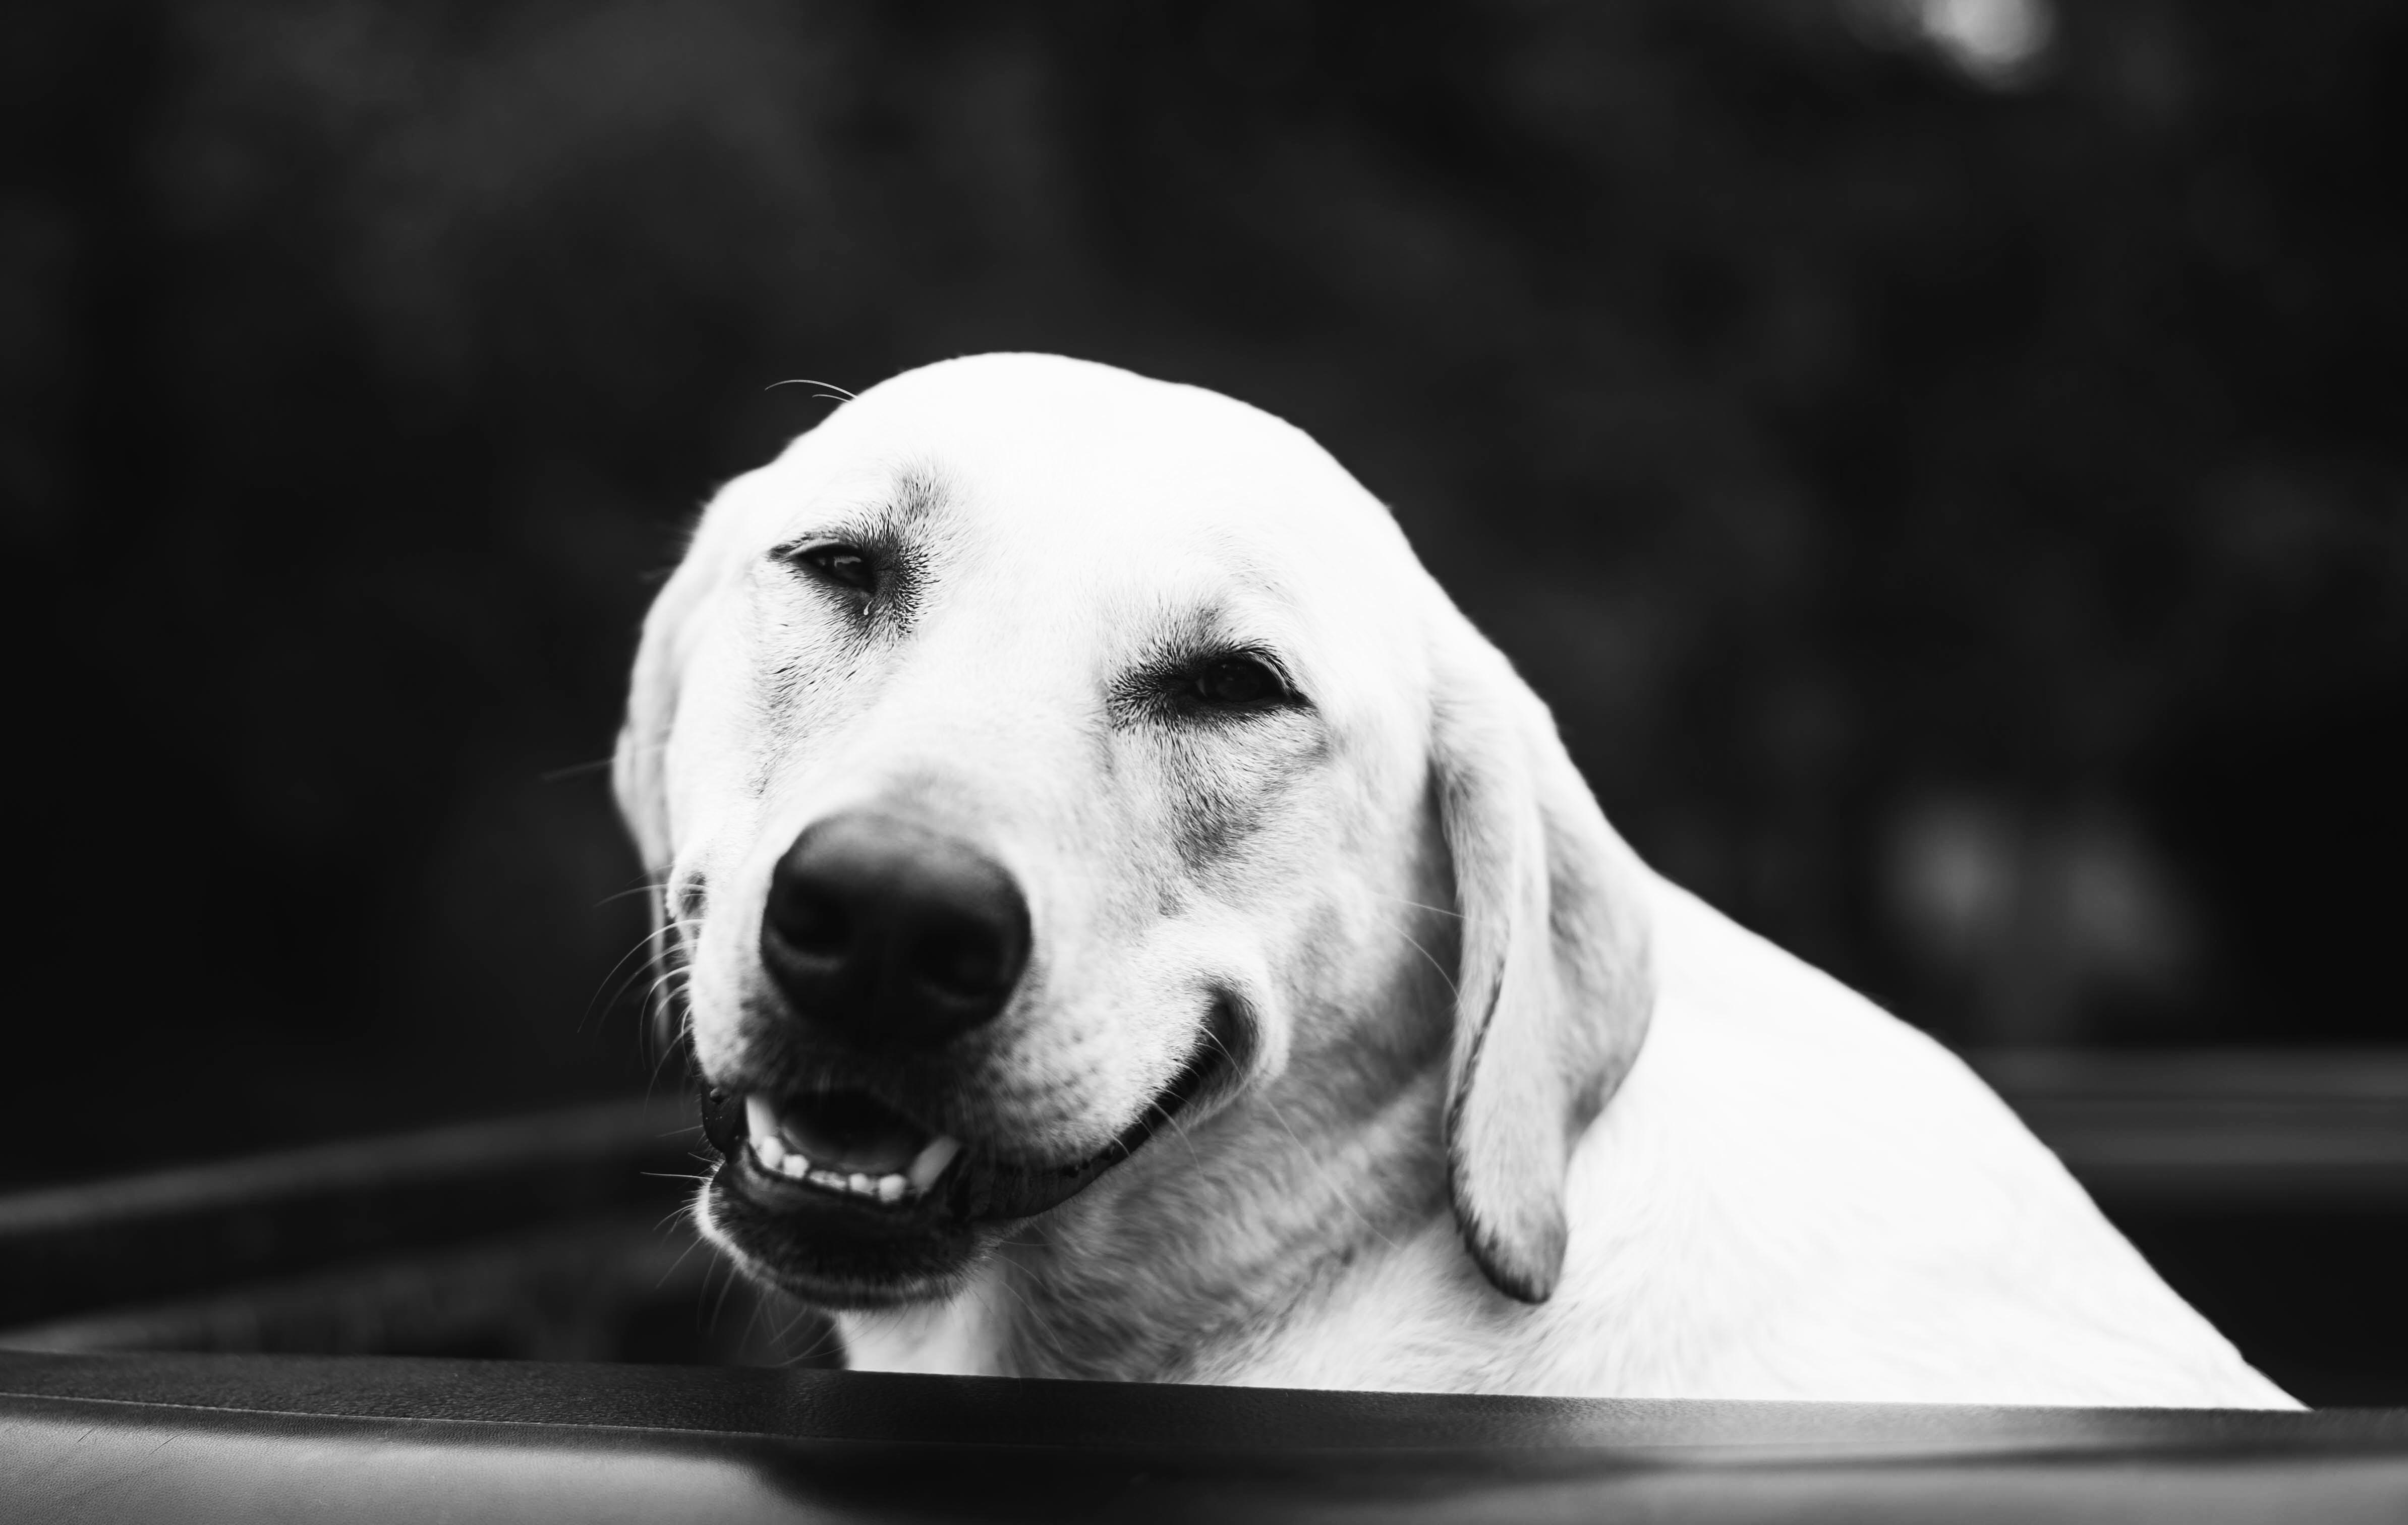 adult yellow Labrador retriever inside black plastic basin